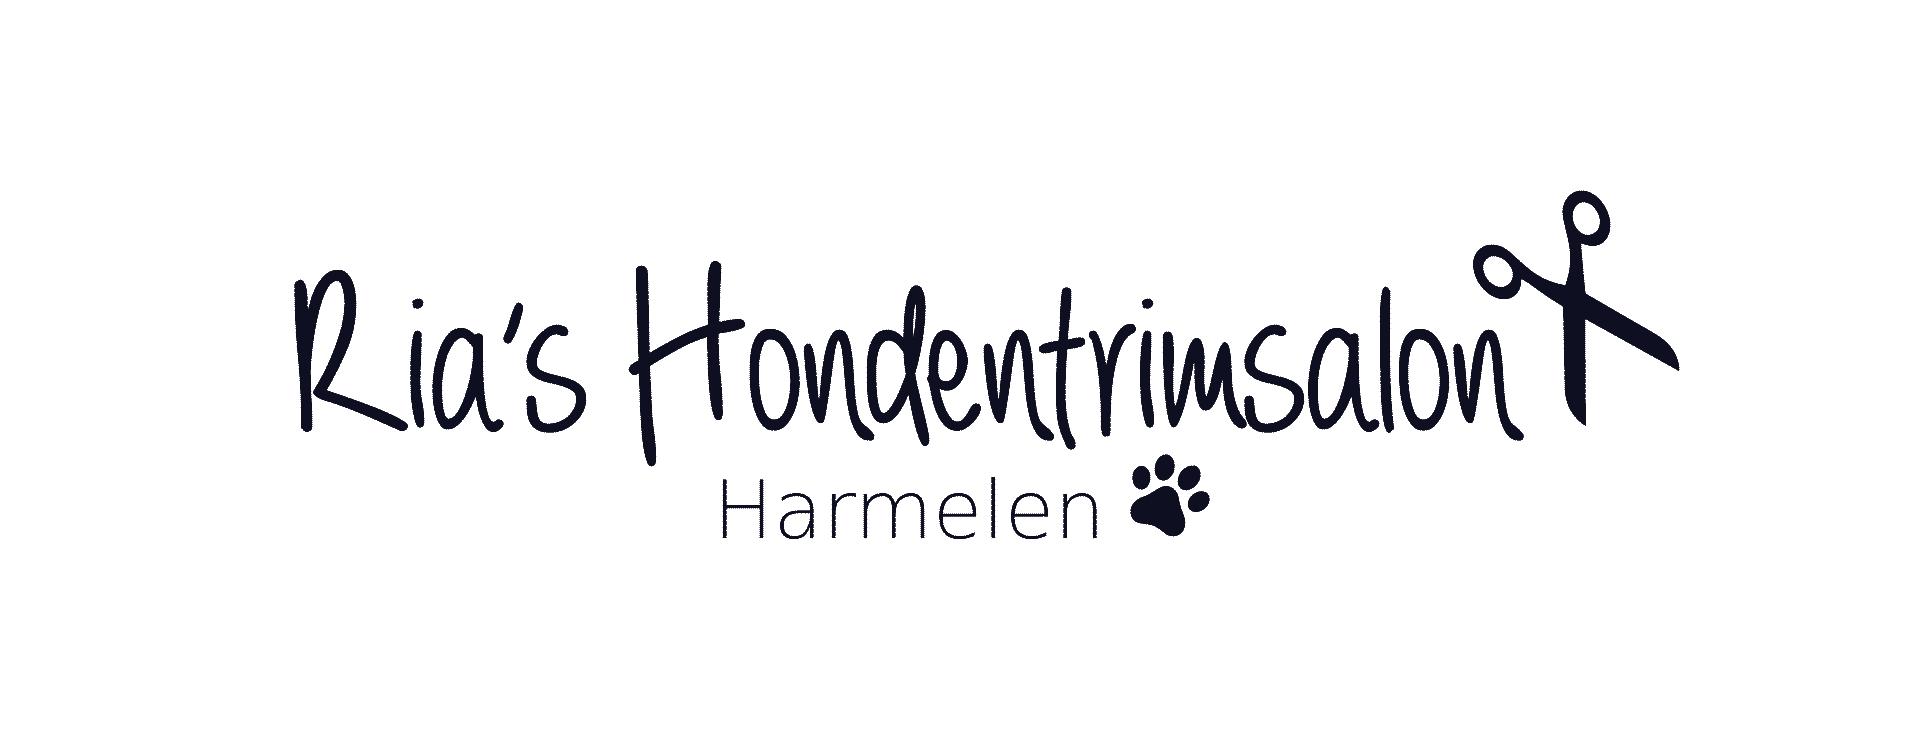 Ria's hondentrimsalon